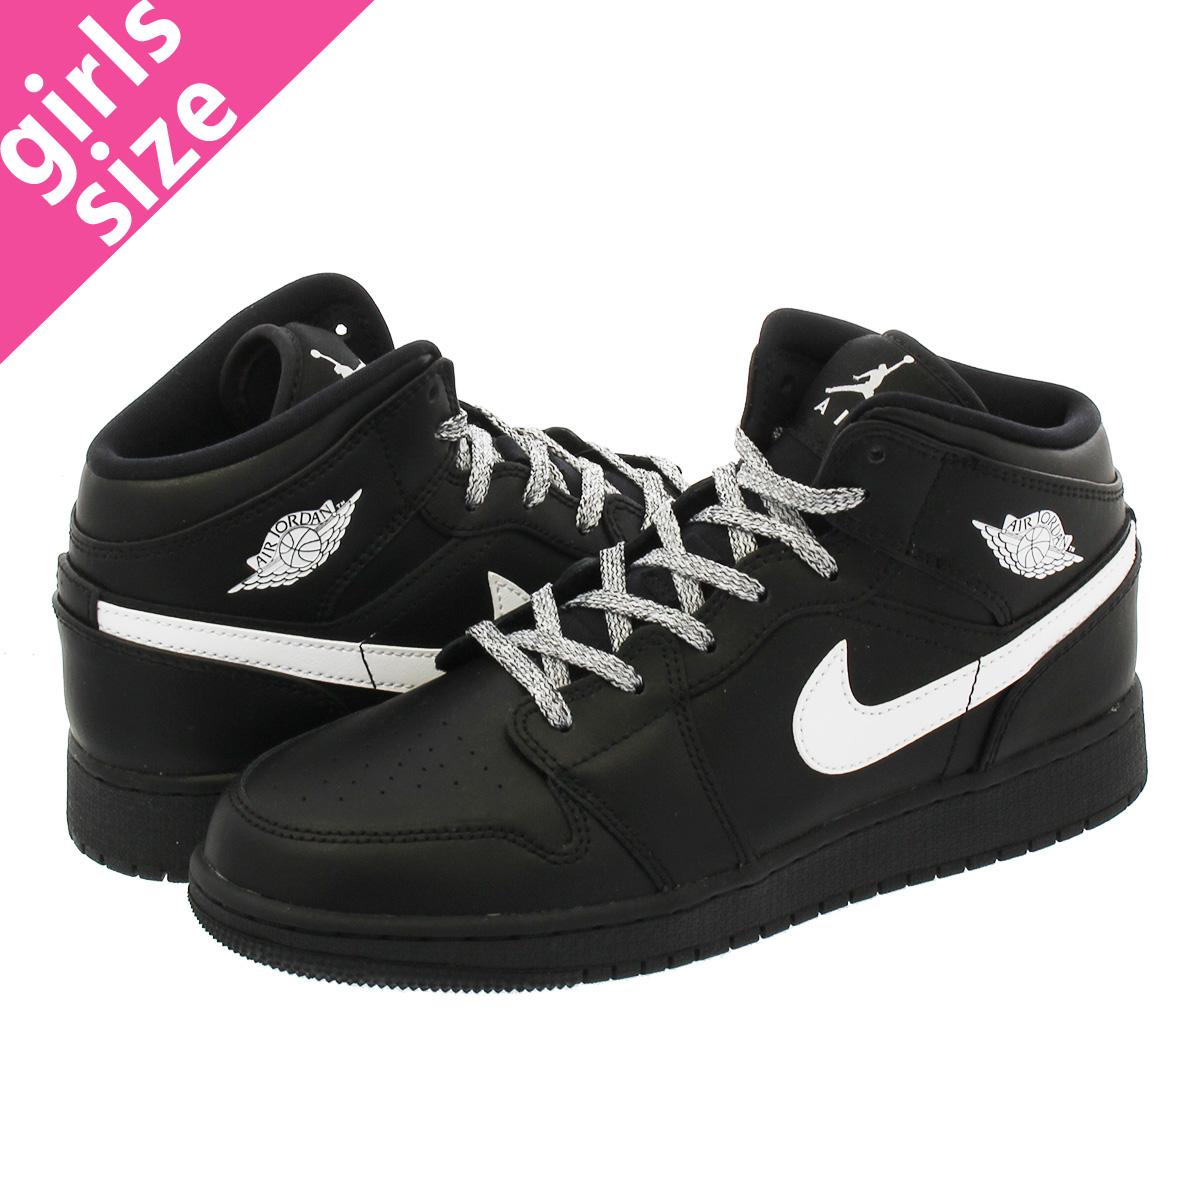 415b5a92dd5 LOWTEX BIG-SMALL SHOP  NIKE AIR JORDAN 1 MID BG Nike Air Jordan 1 ...